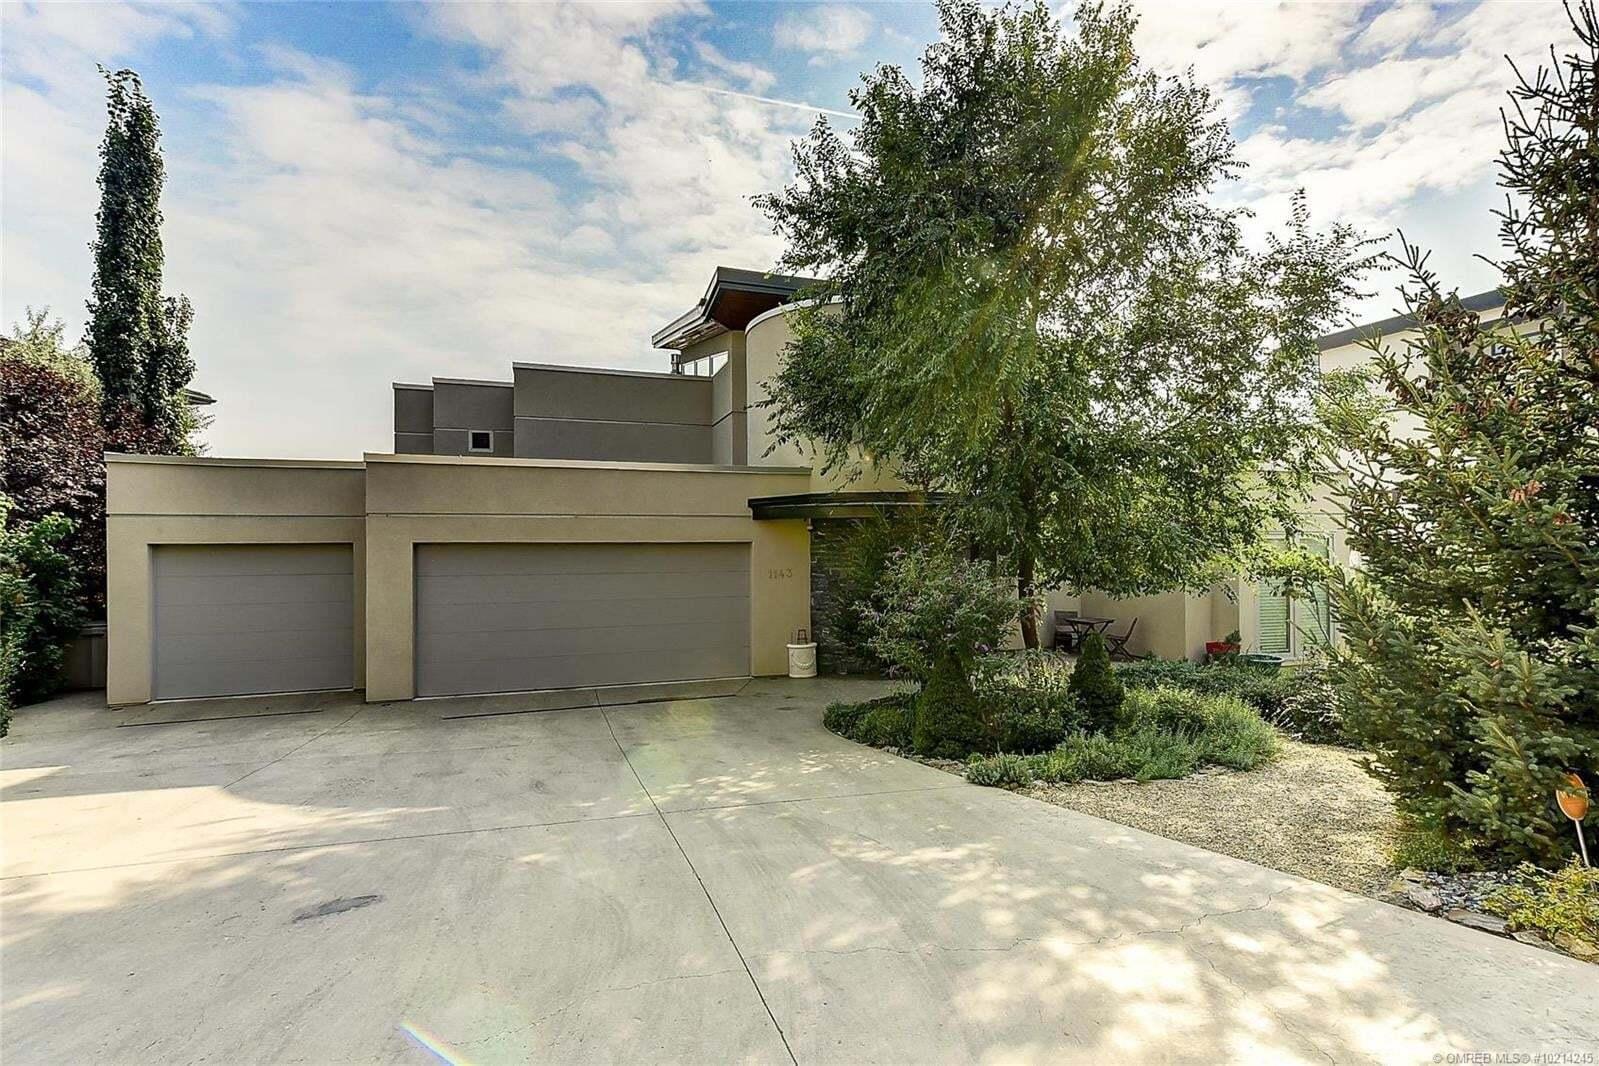 House for sale at 1143 Parkbluff Ln Kelowna British Columbia - MLS: 10214245